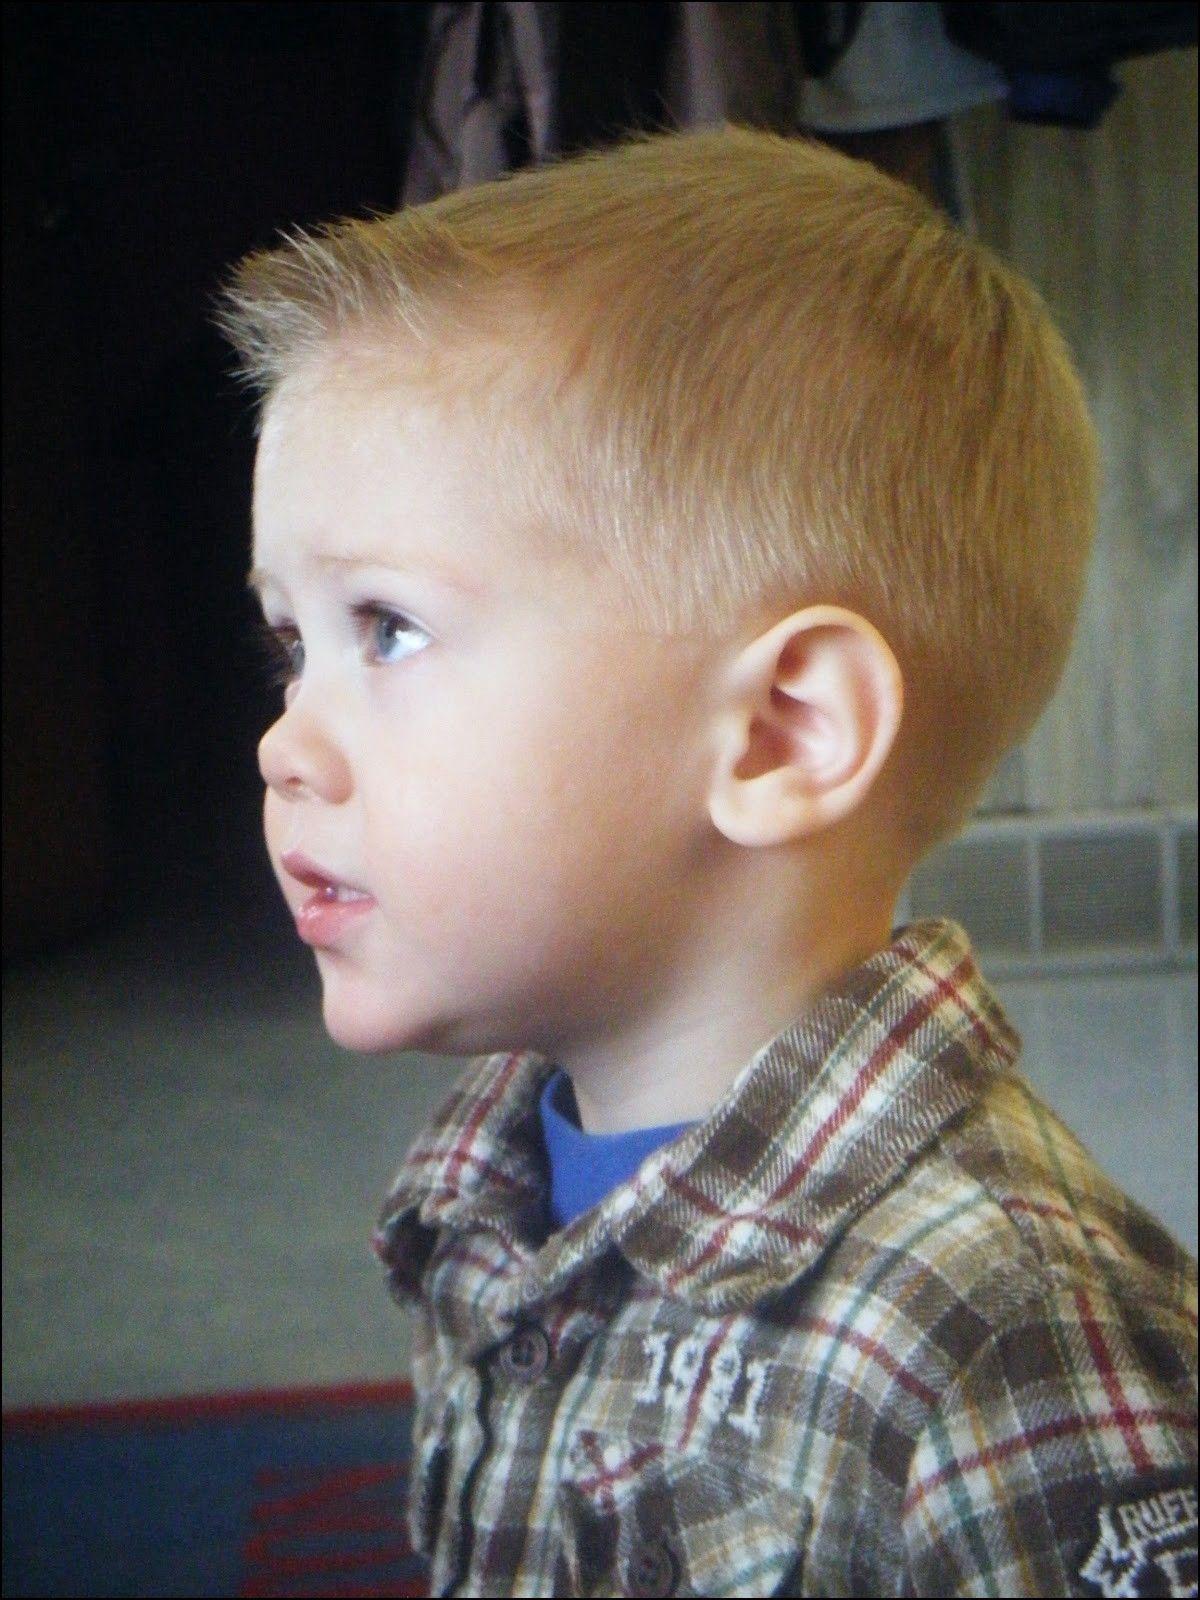 haircut for 1 year old boy | boys haircuts | toddler boy